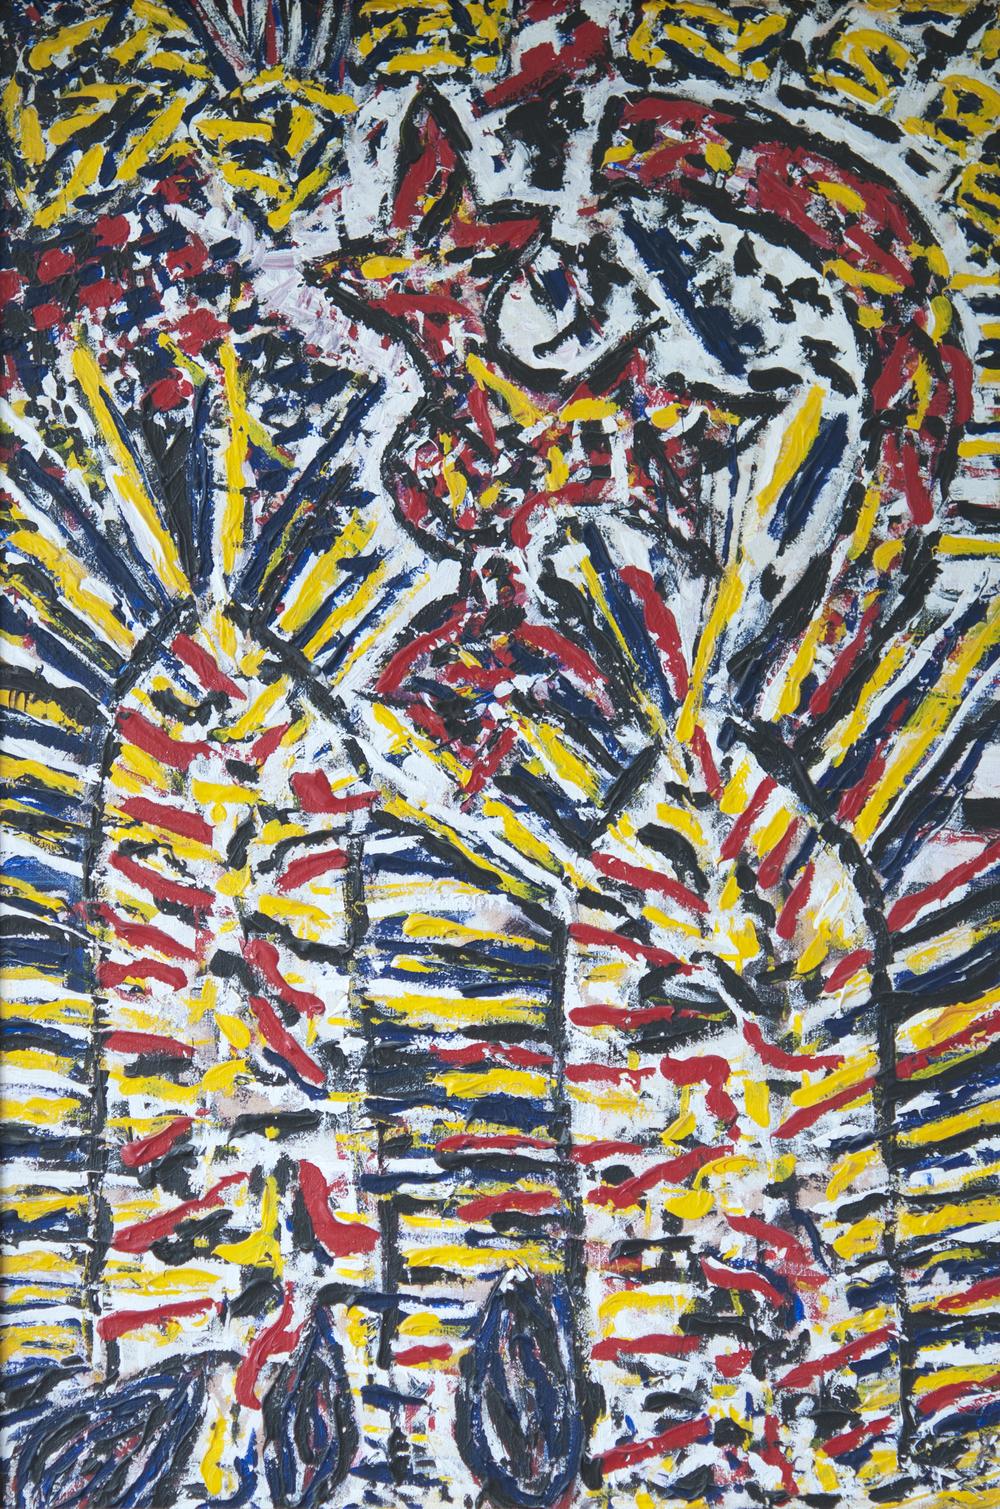 ©KAT   Sienese Fireworks 2  - 1990 - Acrylic on canvas, (1,2 x 0,7m)